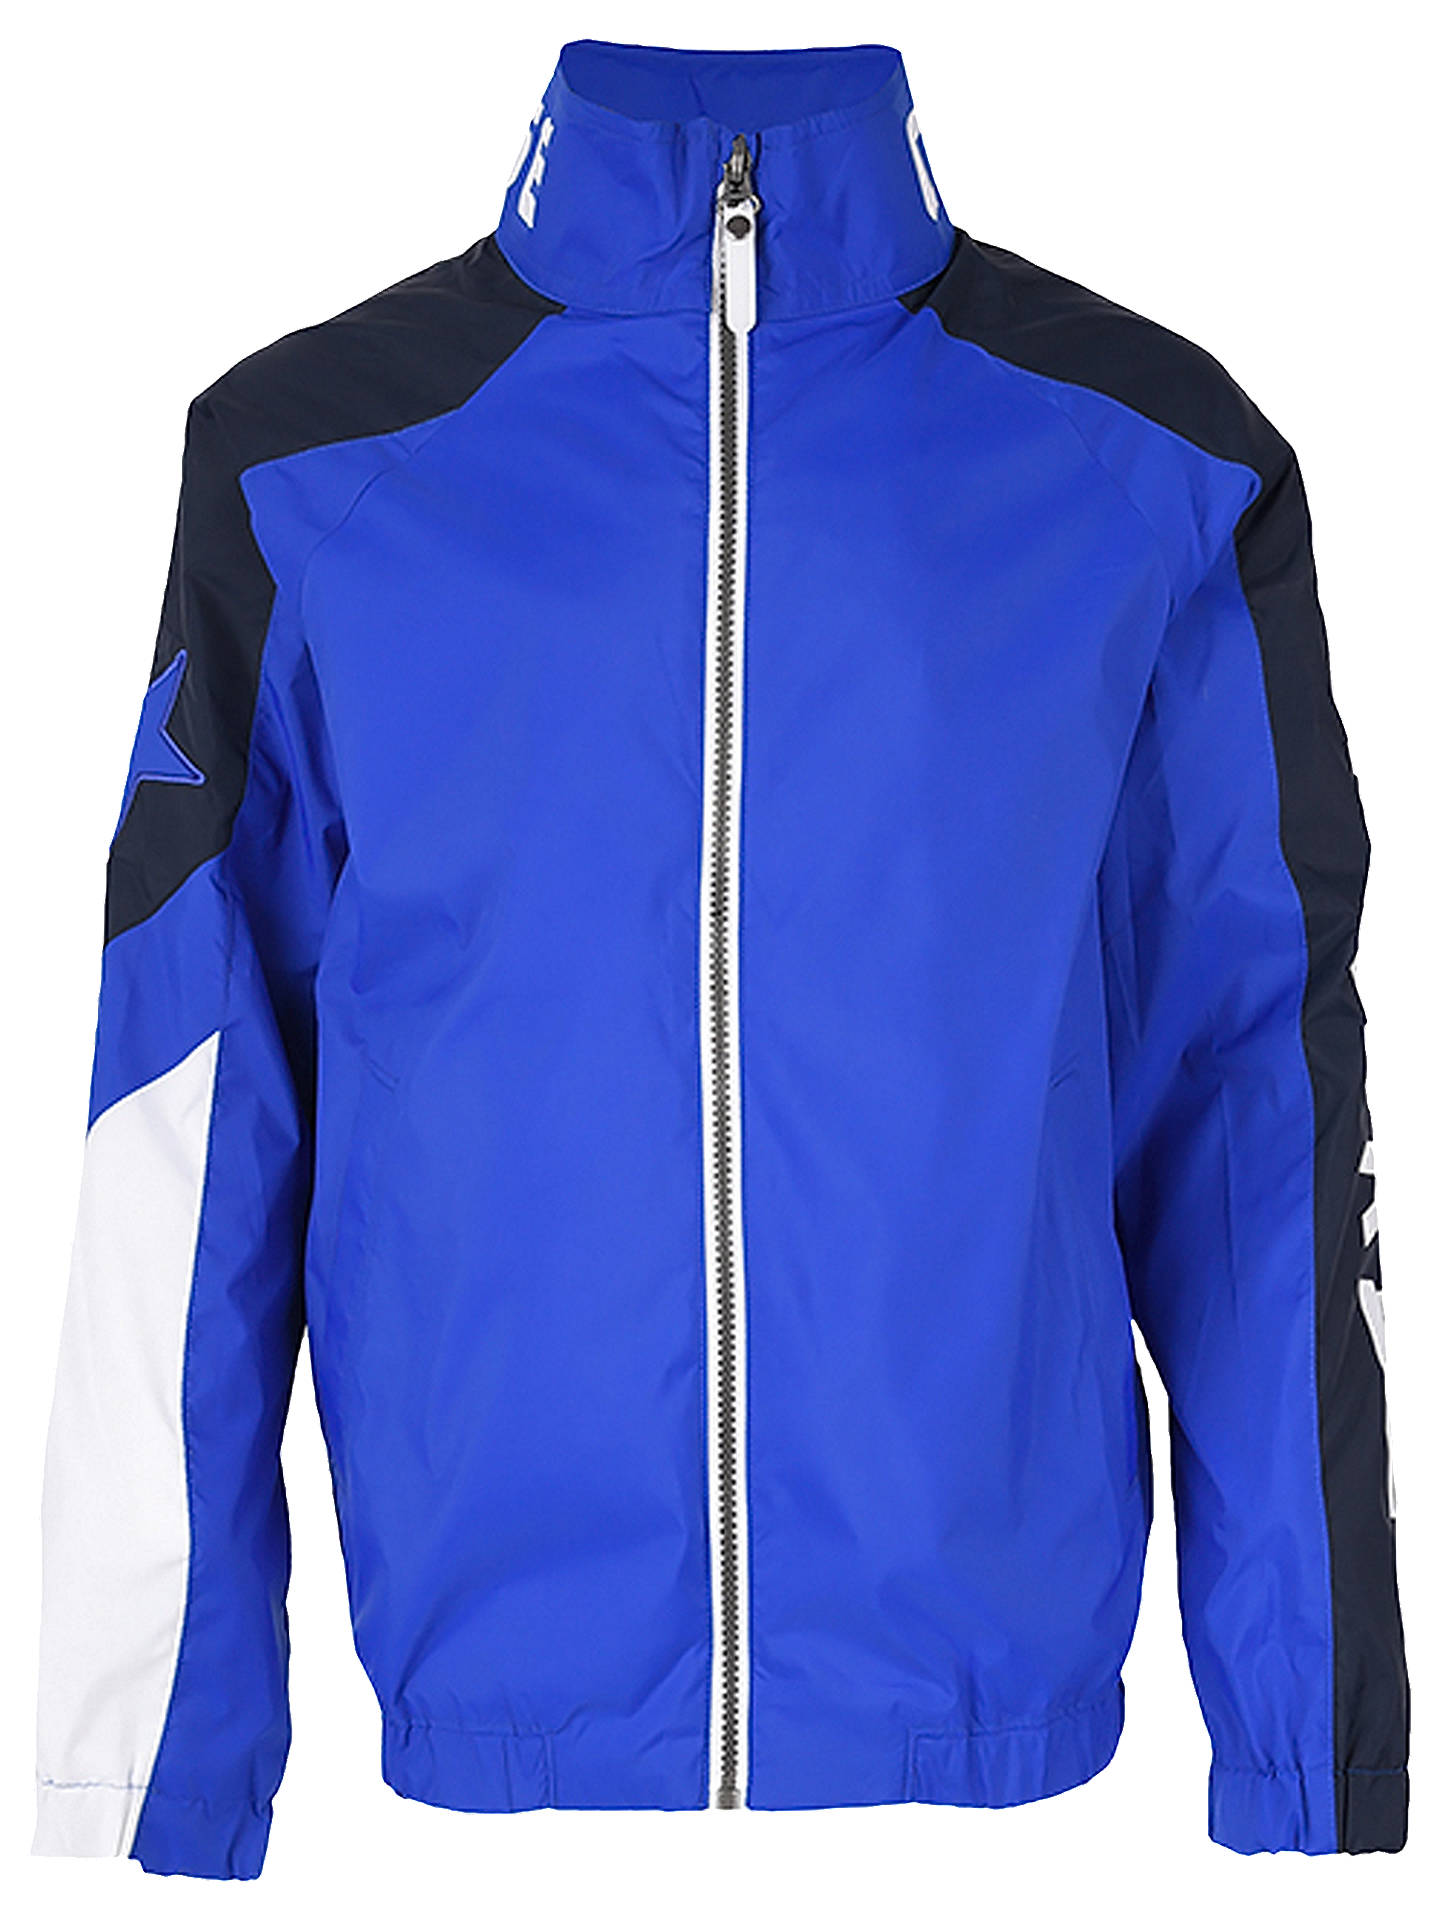 8f63e08fc828 Buy Converse Boys  Woven Sports Bomber Jacket